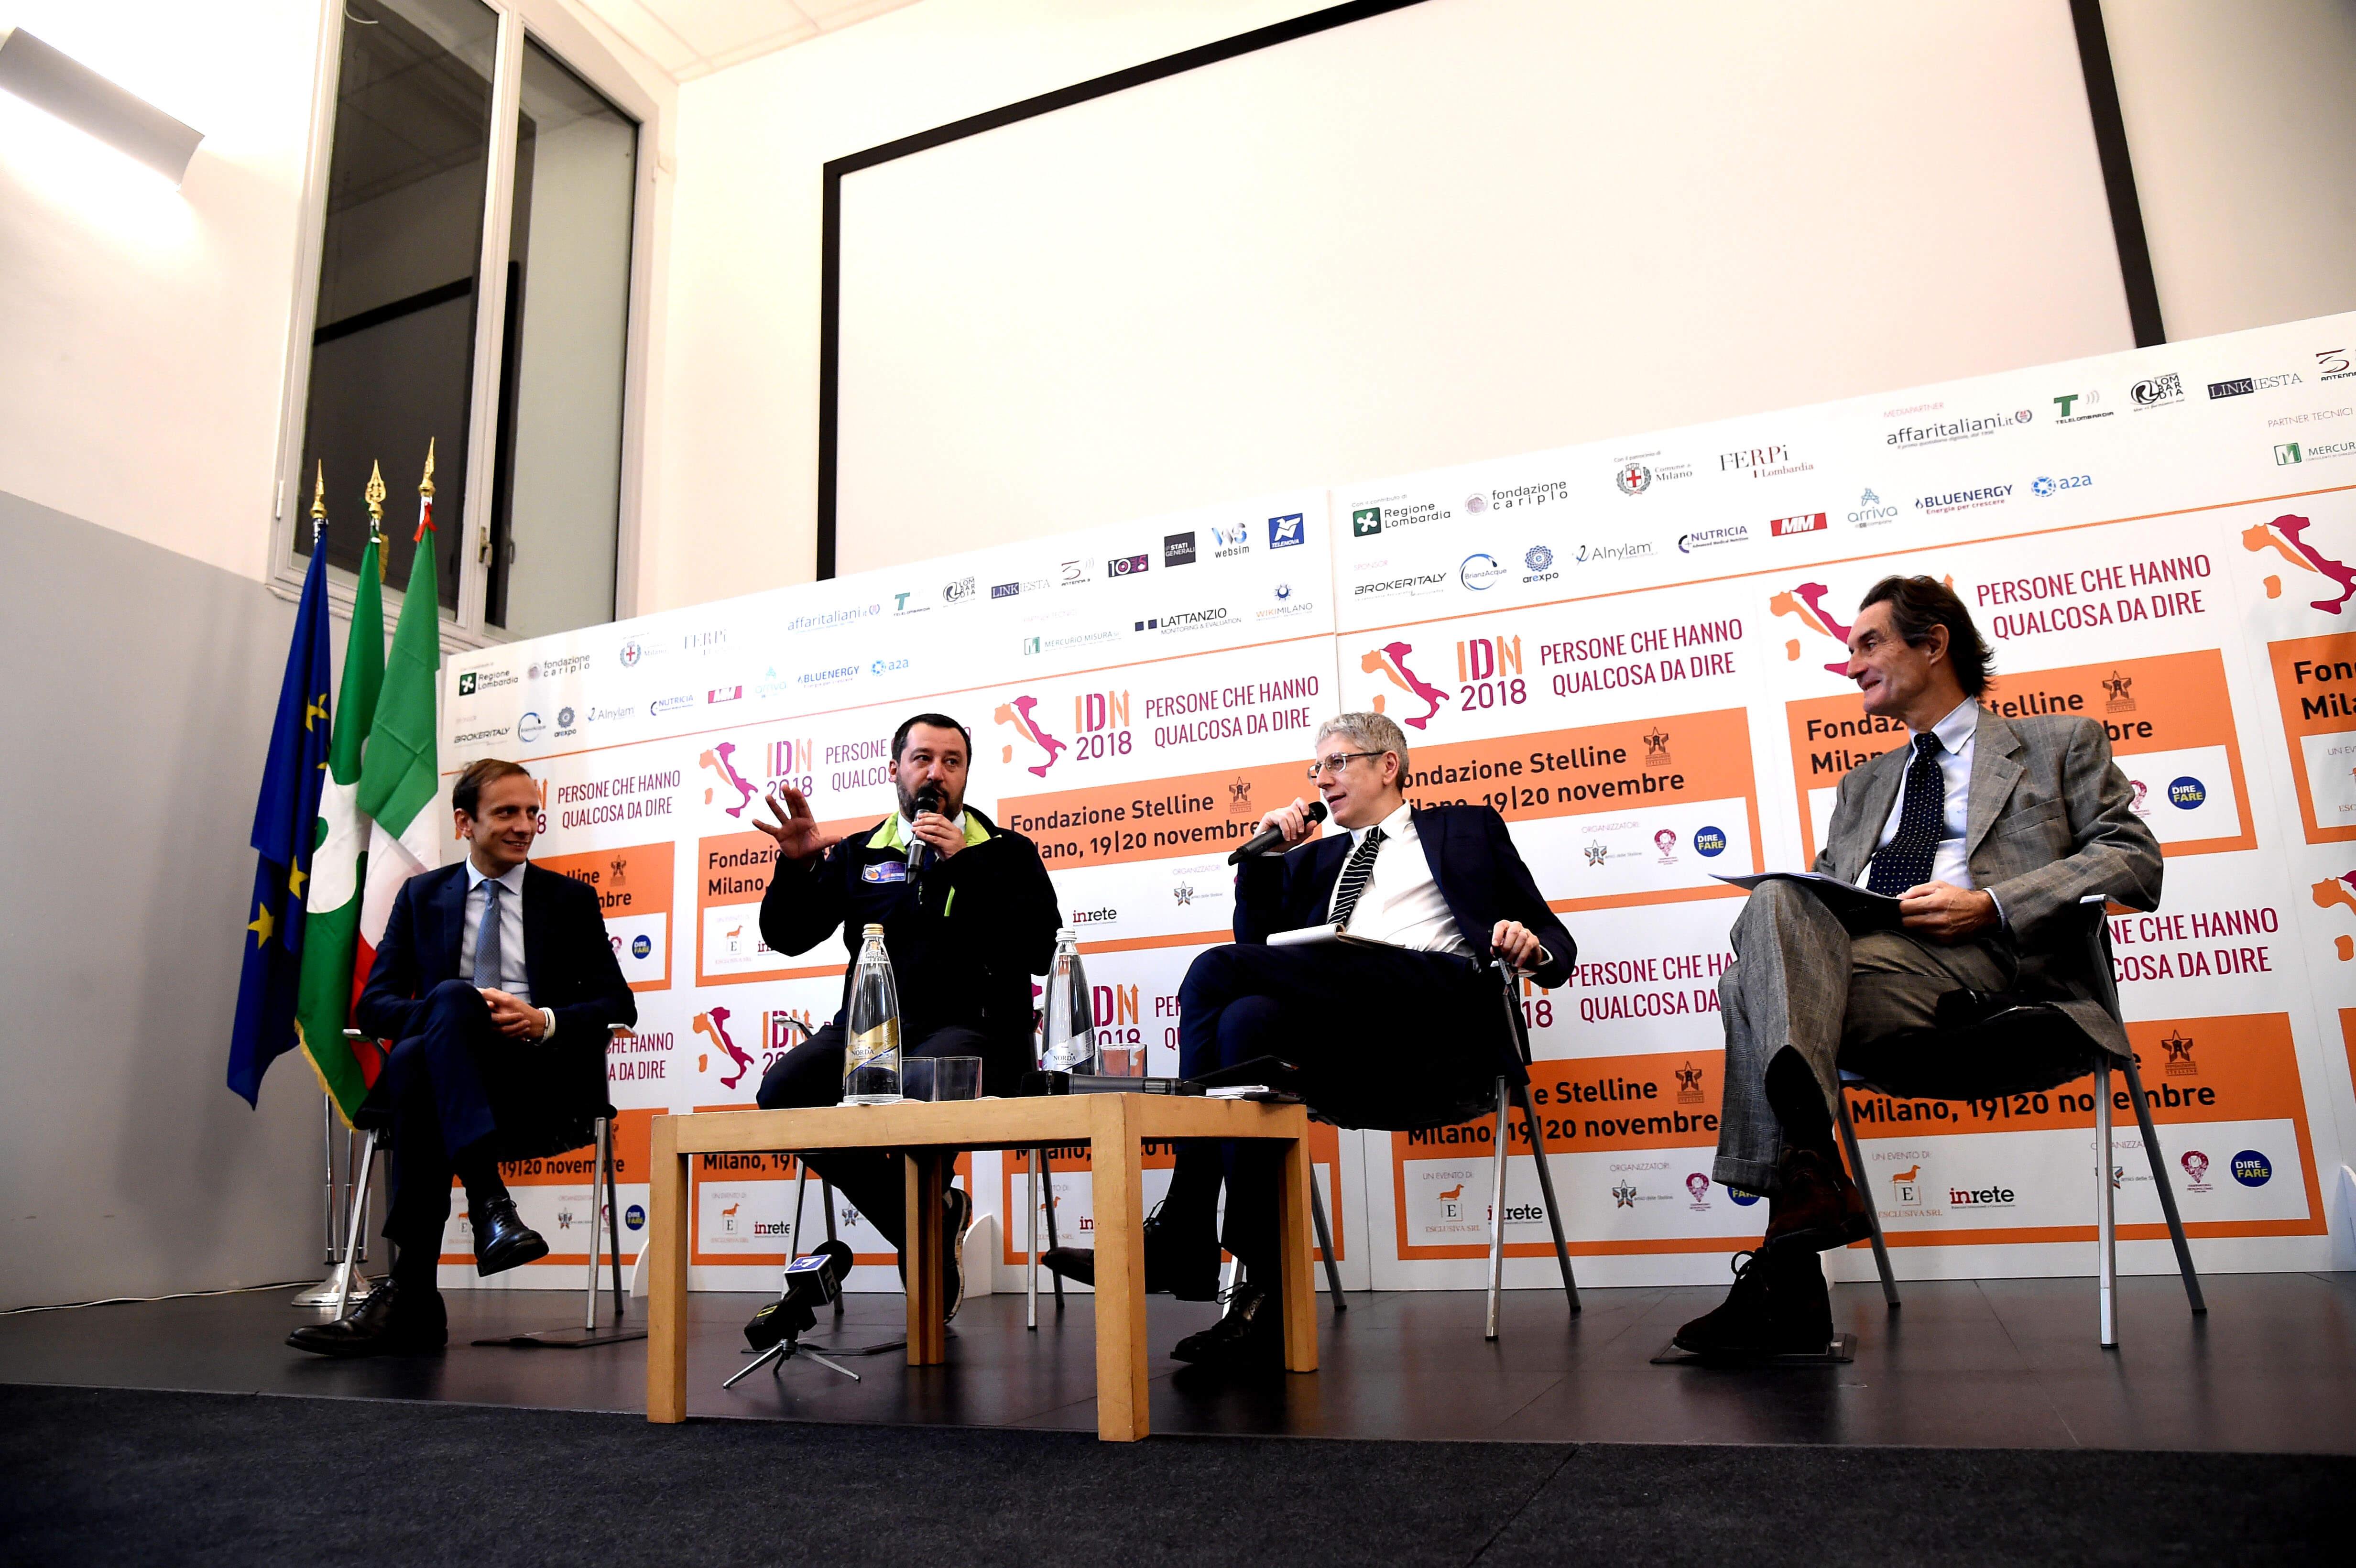 Fedriga_Salvini_Fontana_Inrete_Idn_2018